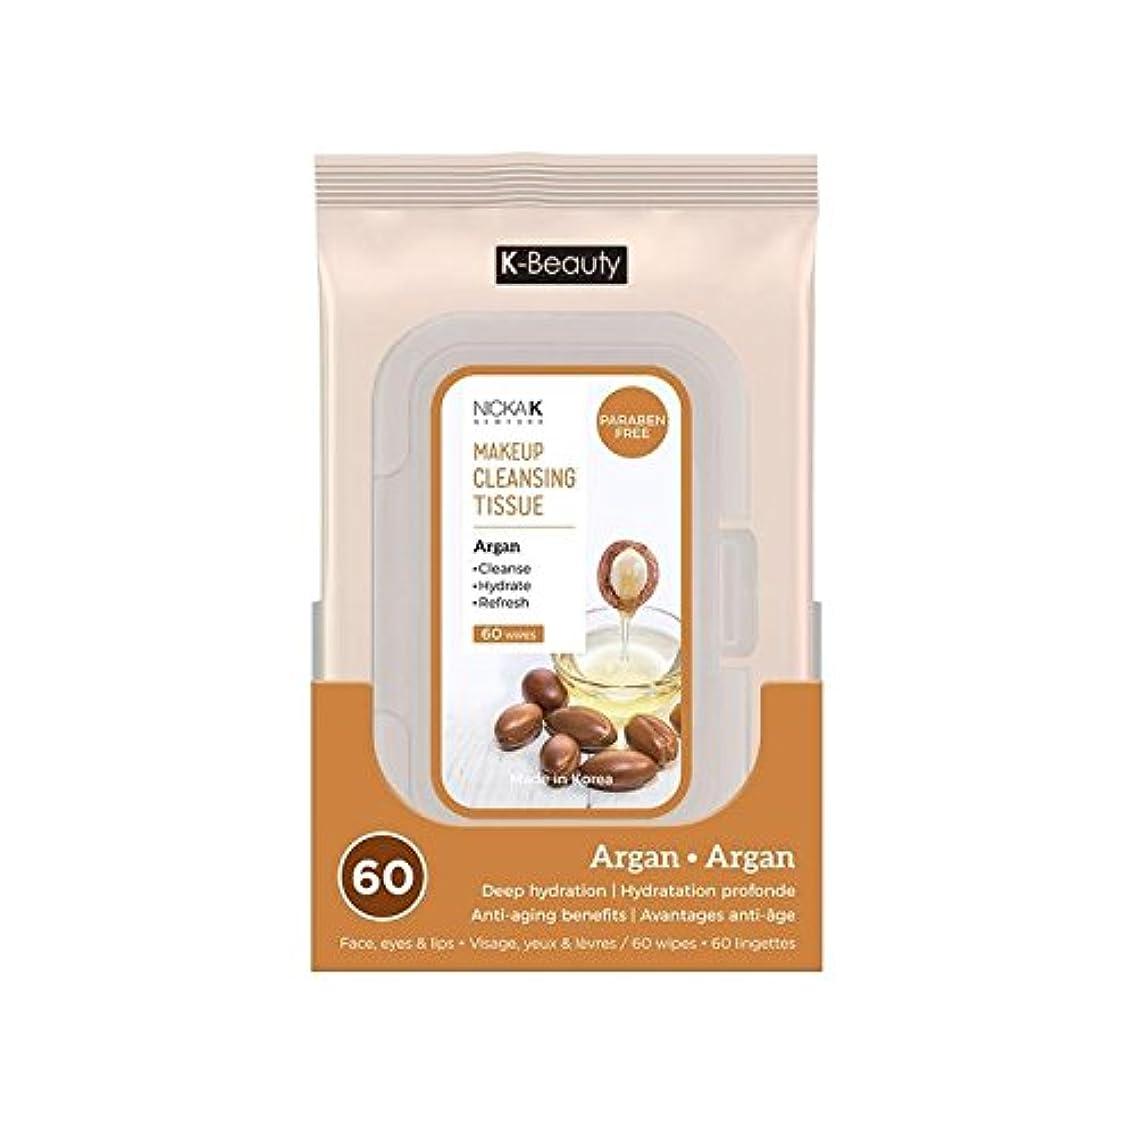 (6 Pack) NICKA K Make Up Cleansing Tissue - Argan (並行輸入品)